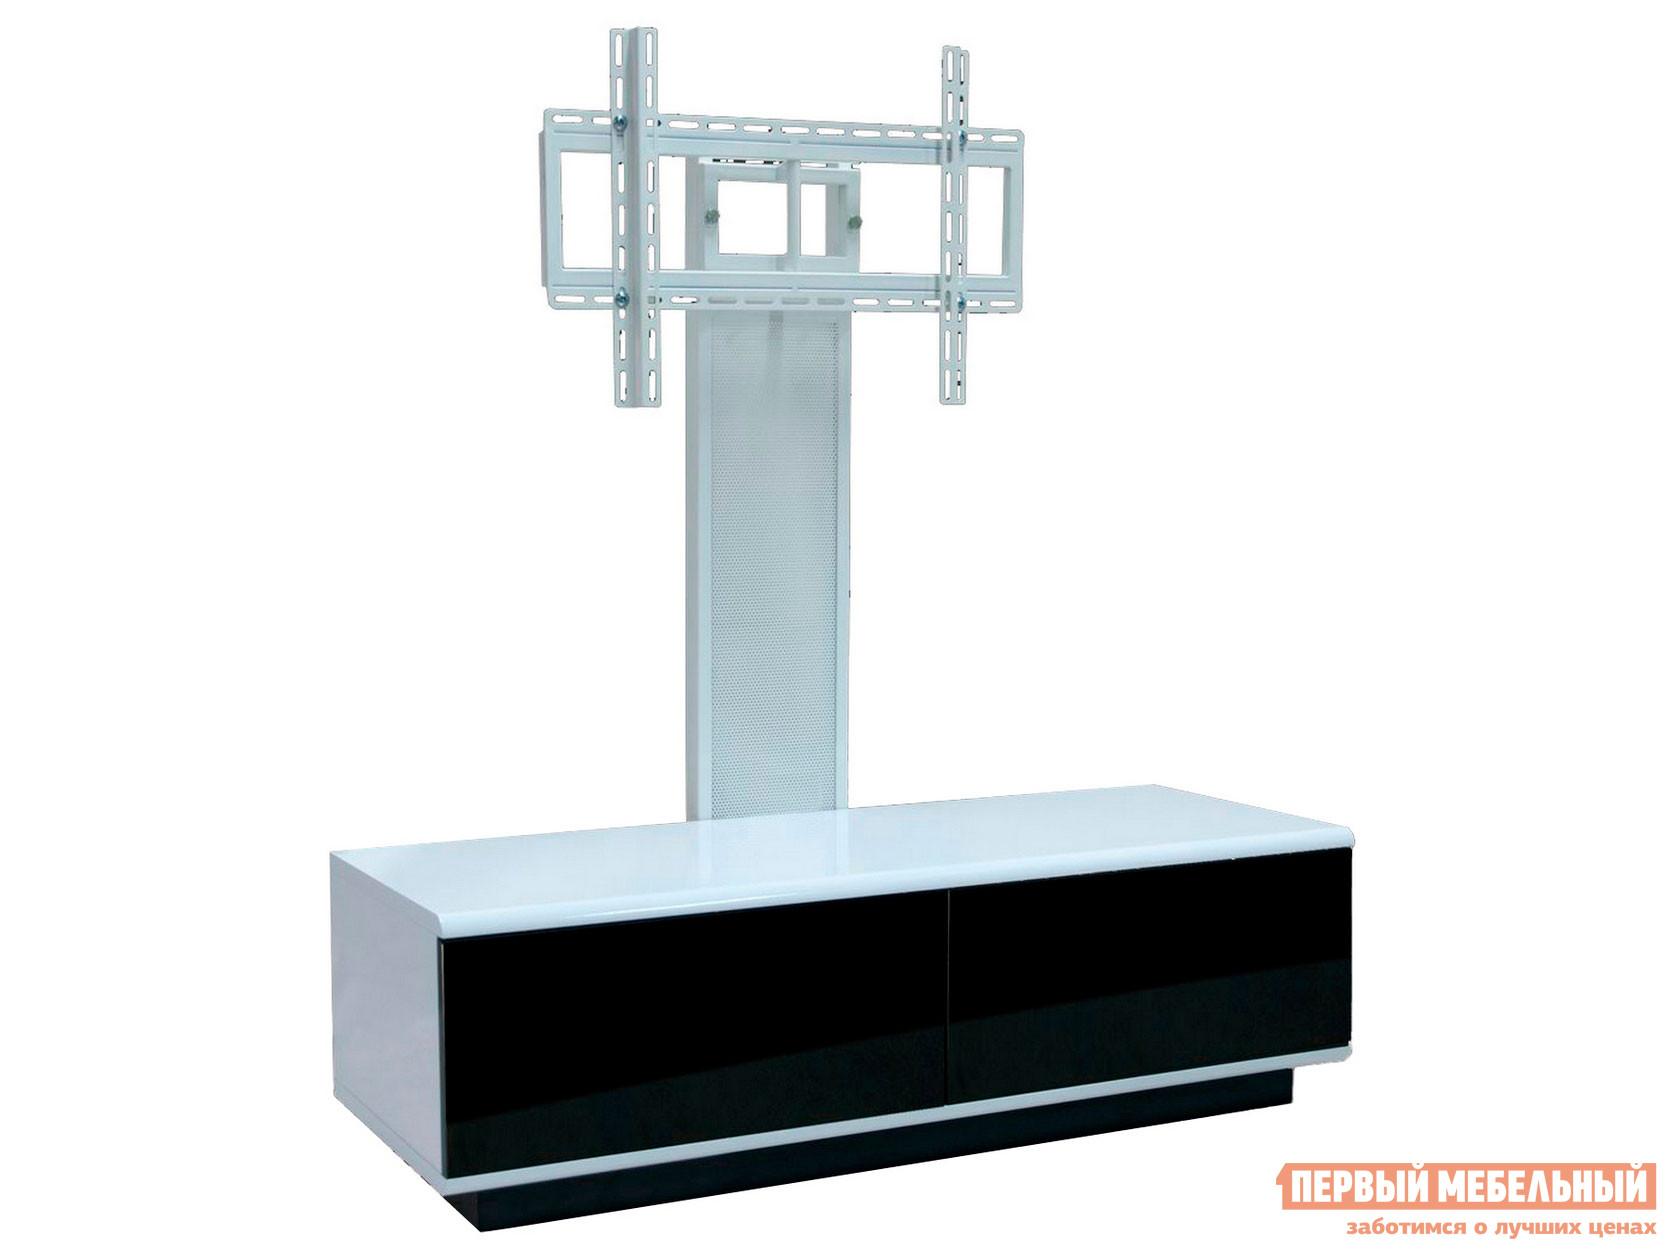 Тумба под телевизор Akur Design Studio Lisewood Decollo mini 2 PS с креплением для ТВ